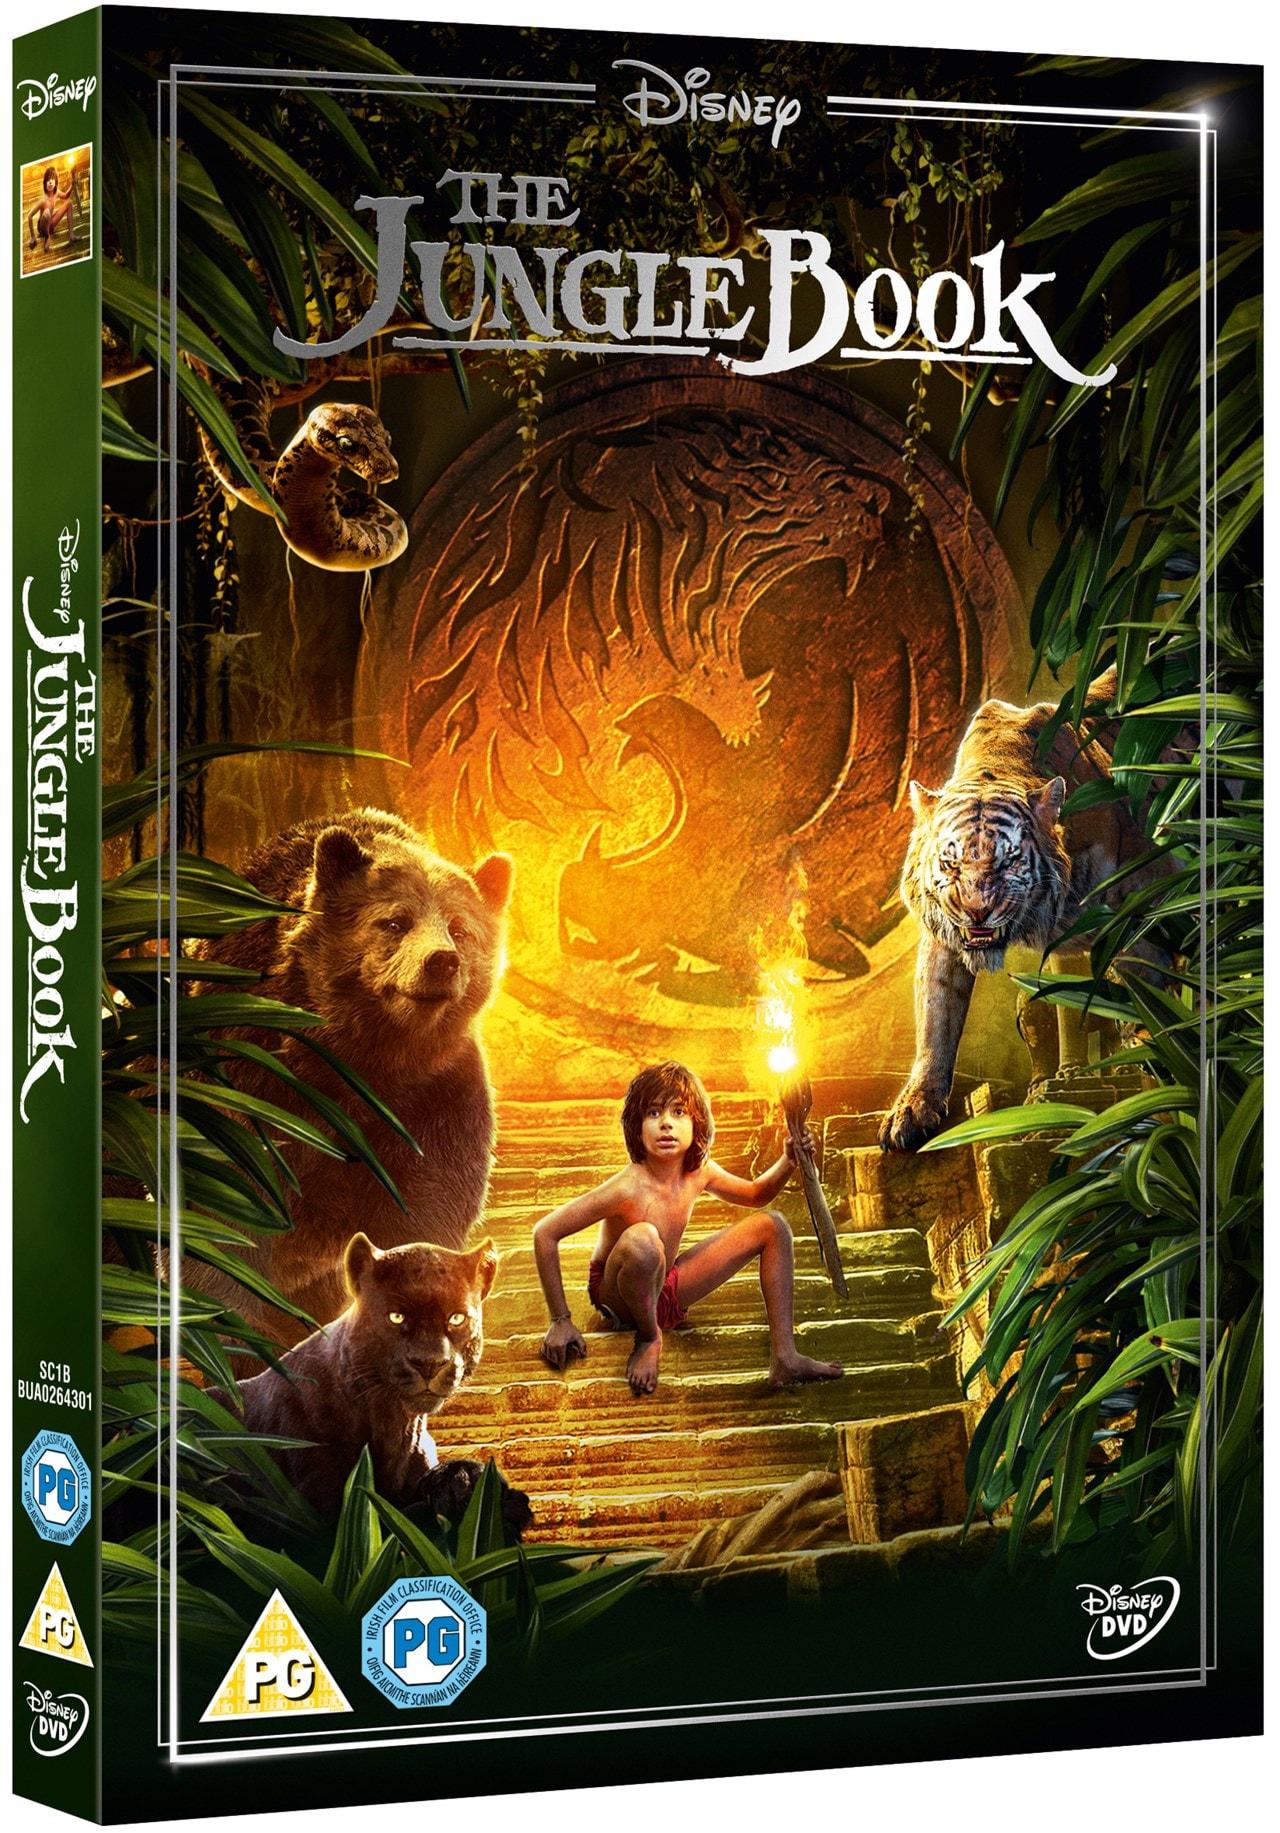 The Jungle Book - 2